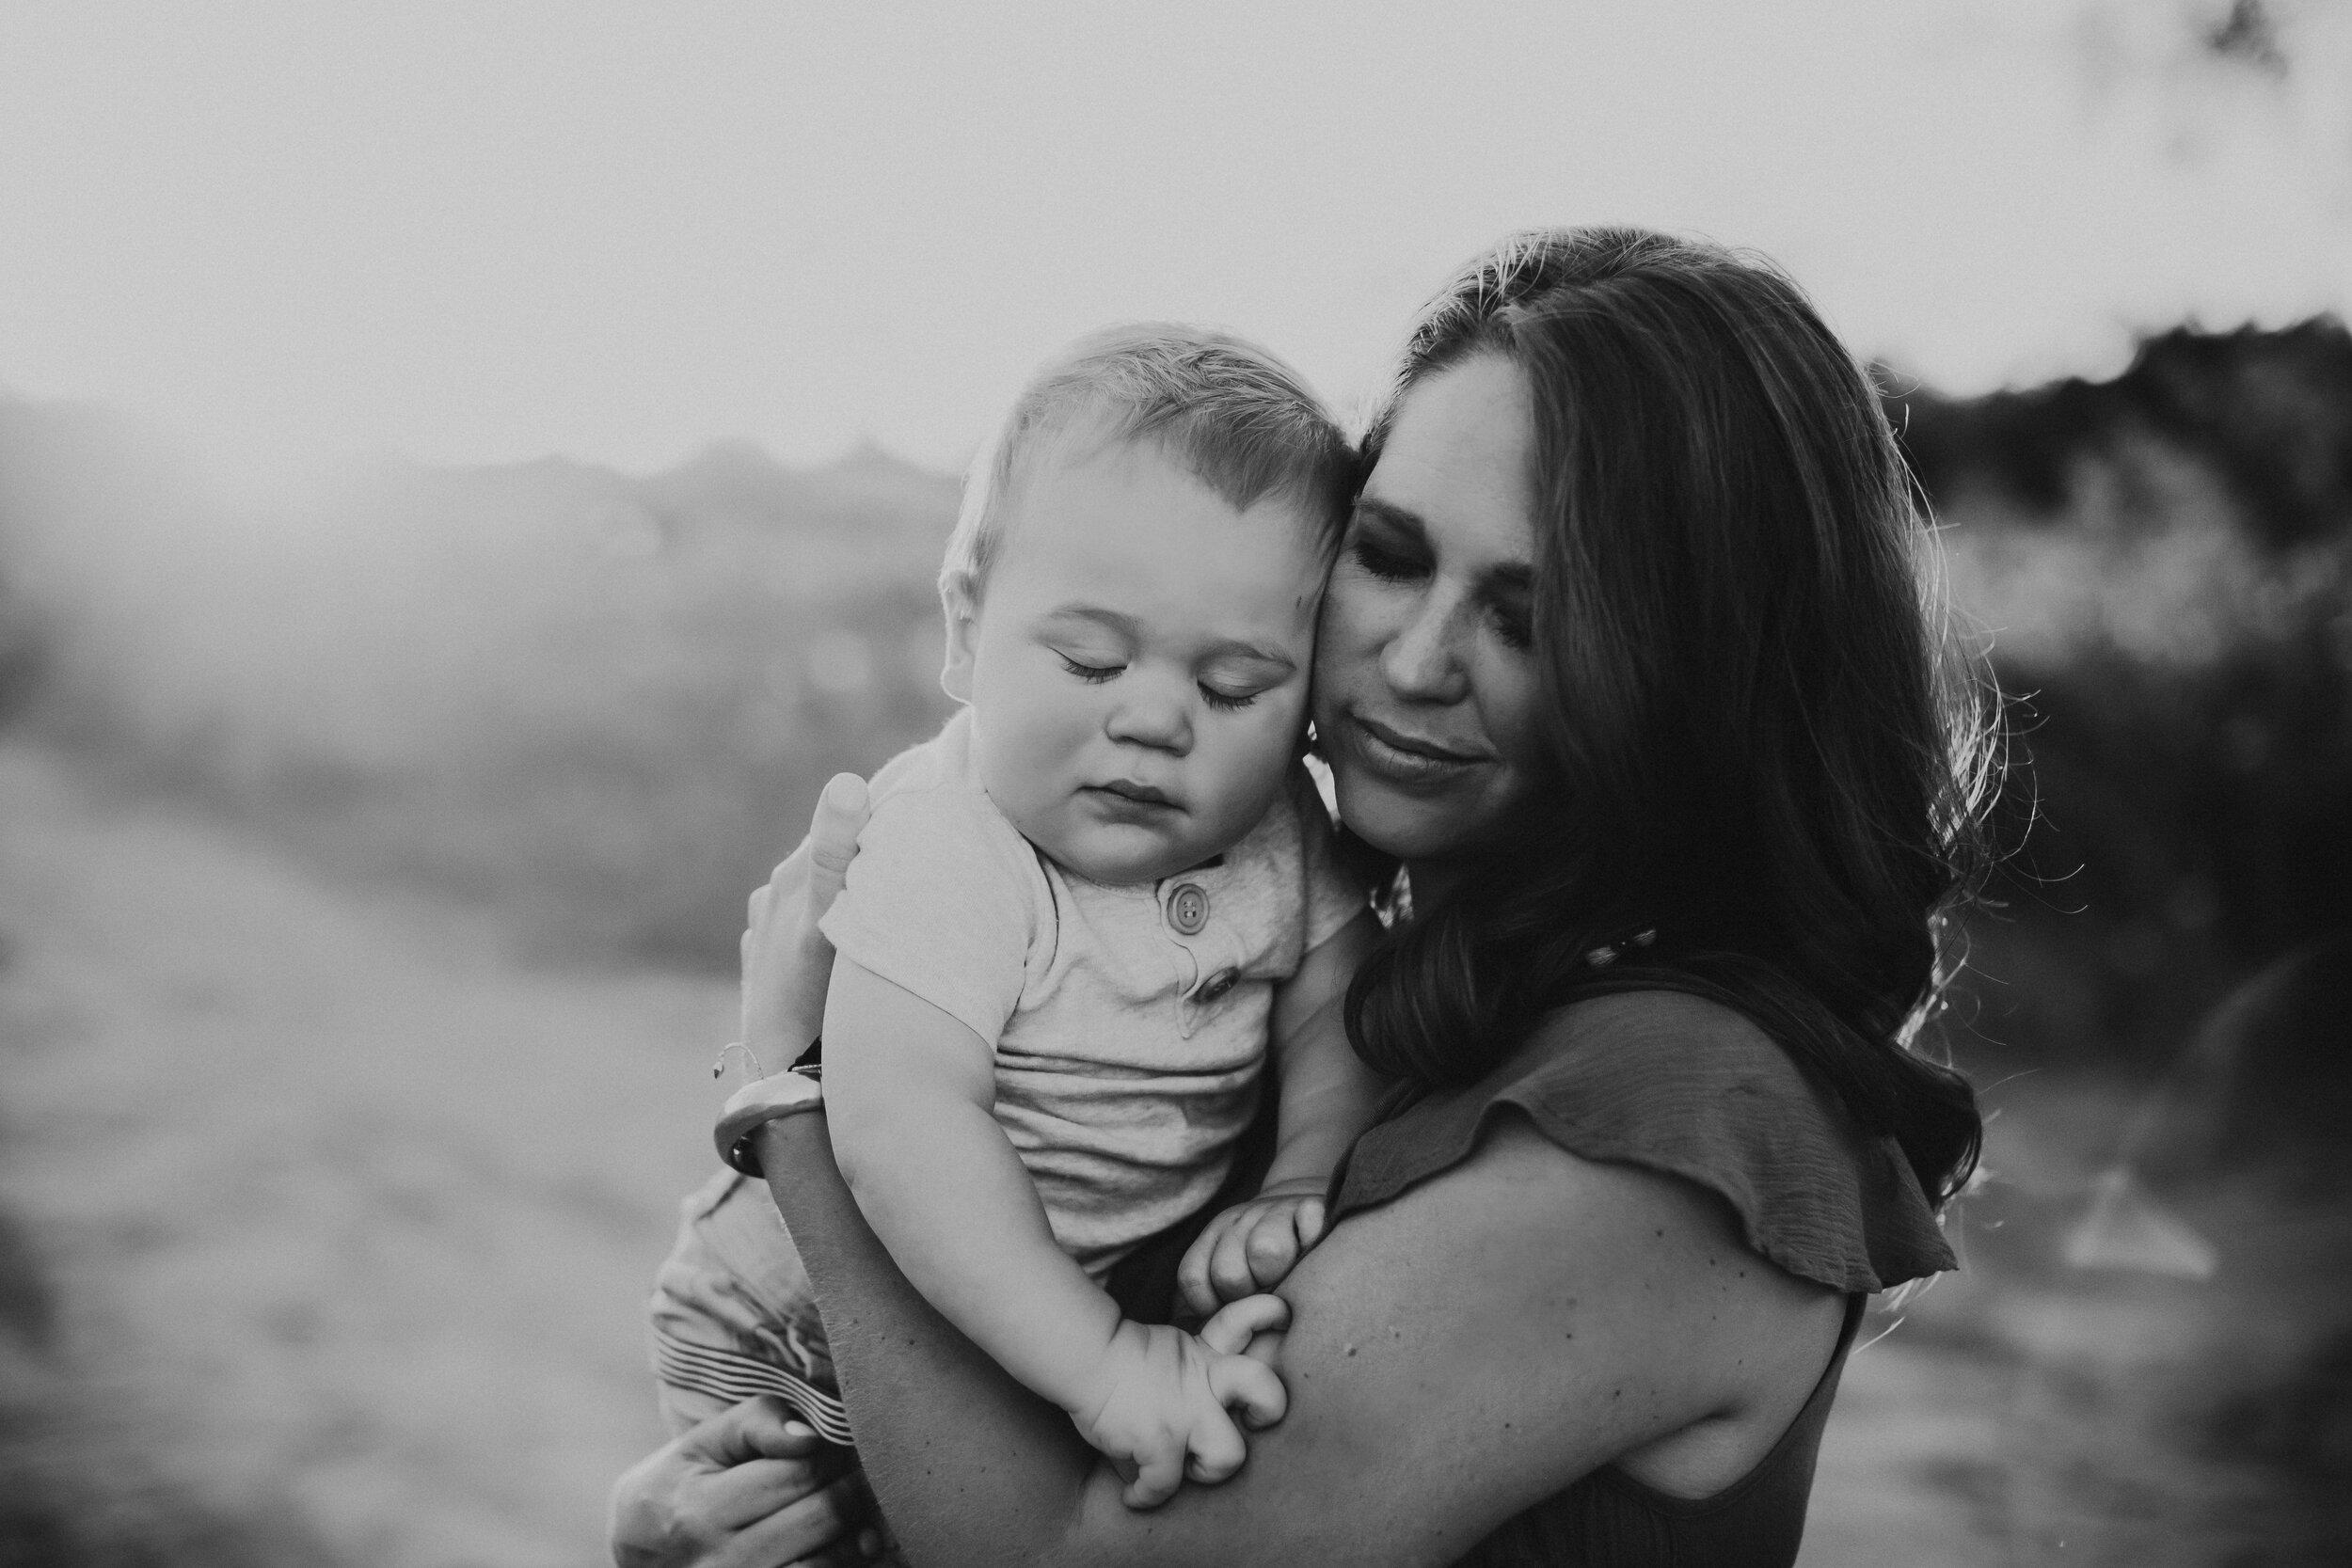 Black and white tender moment between mom and child #tealawardphotography #texasfamilyphotographer #amarillophotographer #amarillofamilyphotographer #lifestylephotography #emotionalphotography #familyphotoshoot #family #lovingsiblings #purejoy #familyphotos #naturalfamilyinteraction